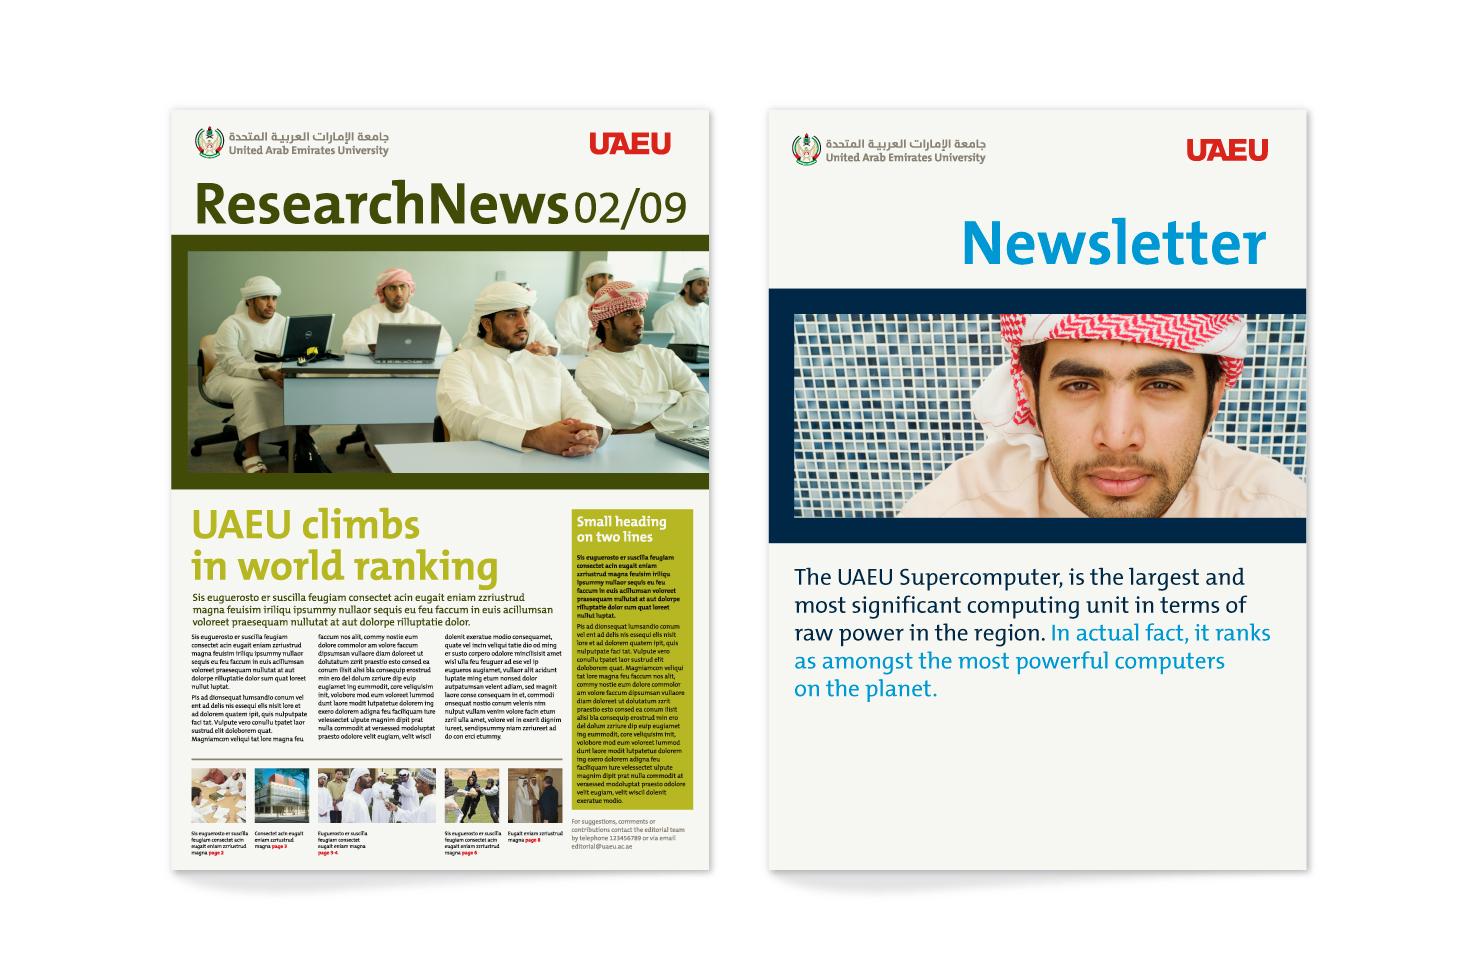 UAEU magazine and newsletter